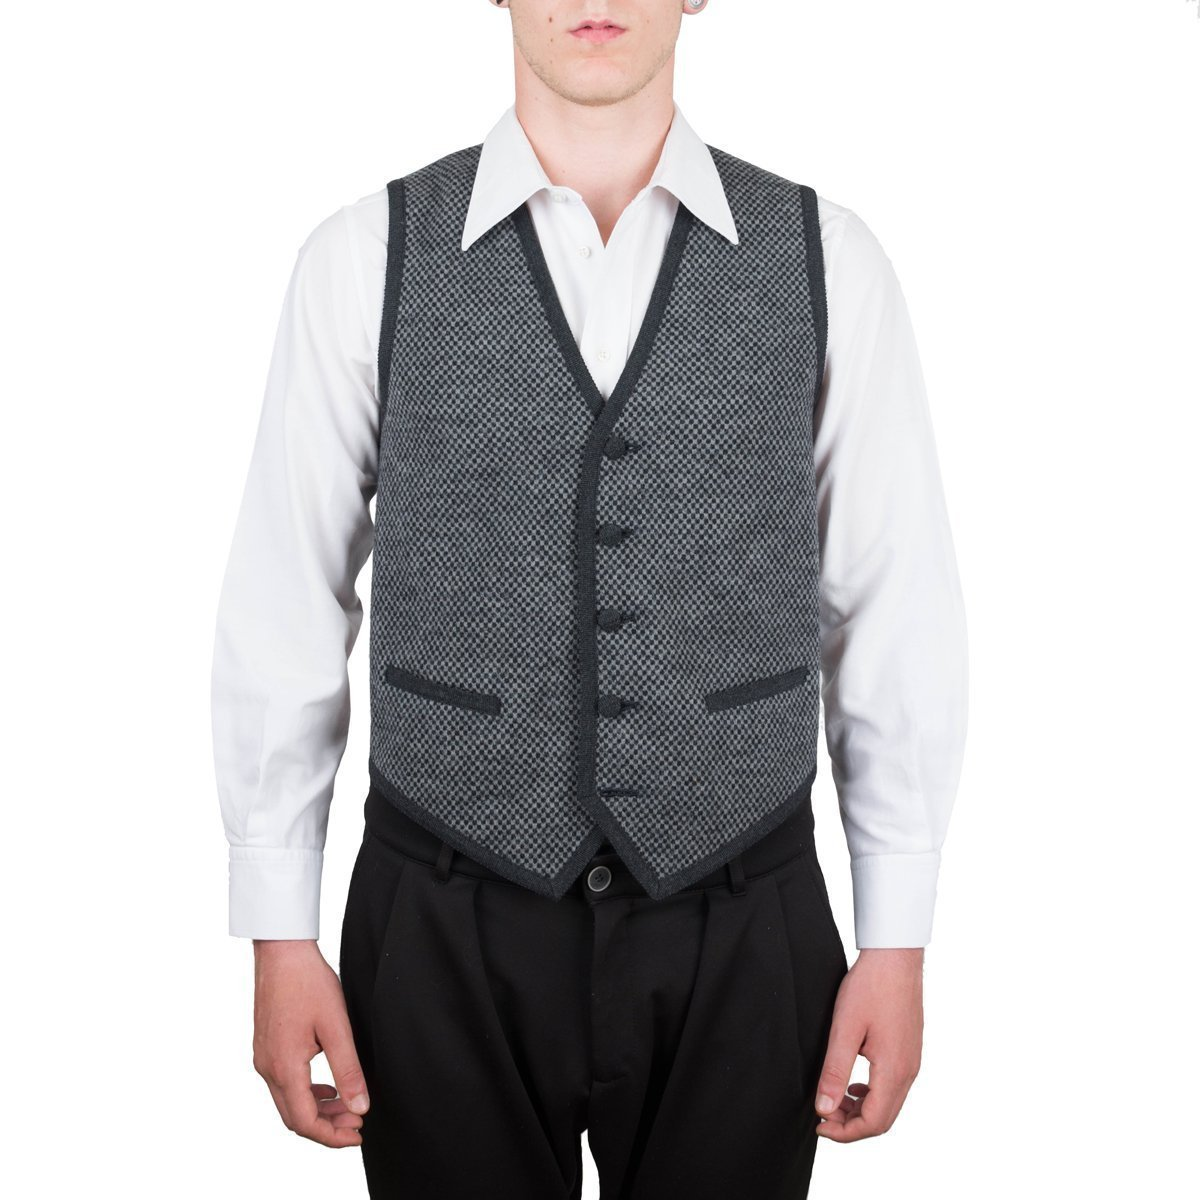 Vest, Gilet, Waistcoat, Knitwear, Men, Boy, Black, Grey, Check, Wool, Buttons, Pockets, Casual, Business, Formal, Sleeveless, Italian Fabric, Italian Style, Made in Italy, Handmade